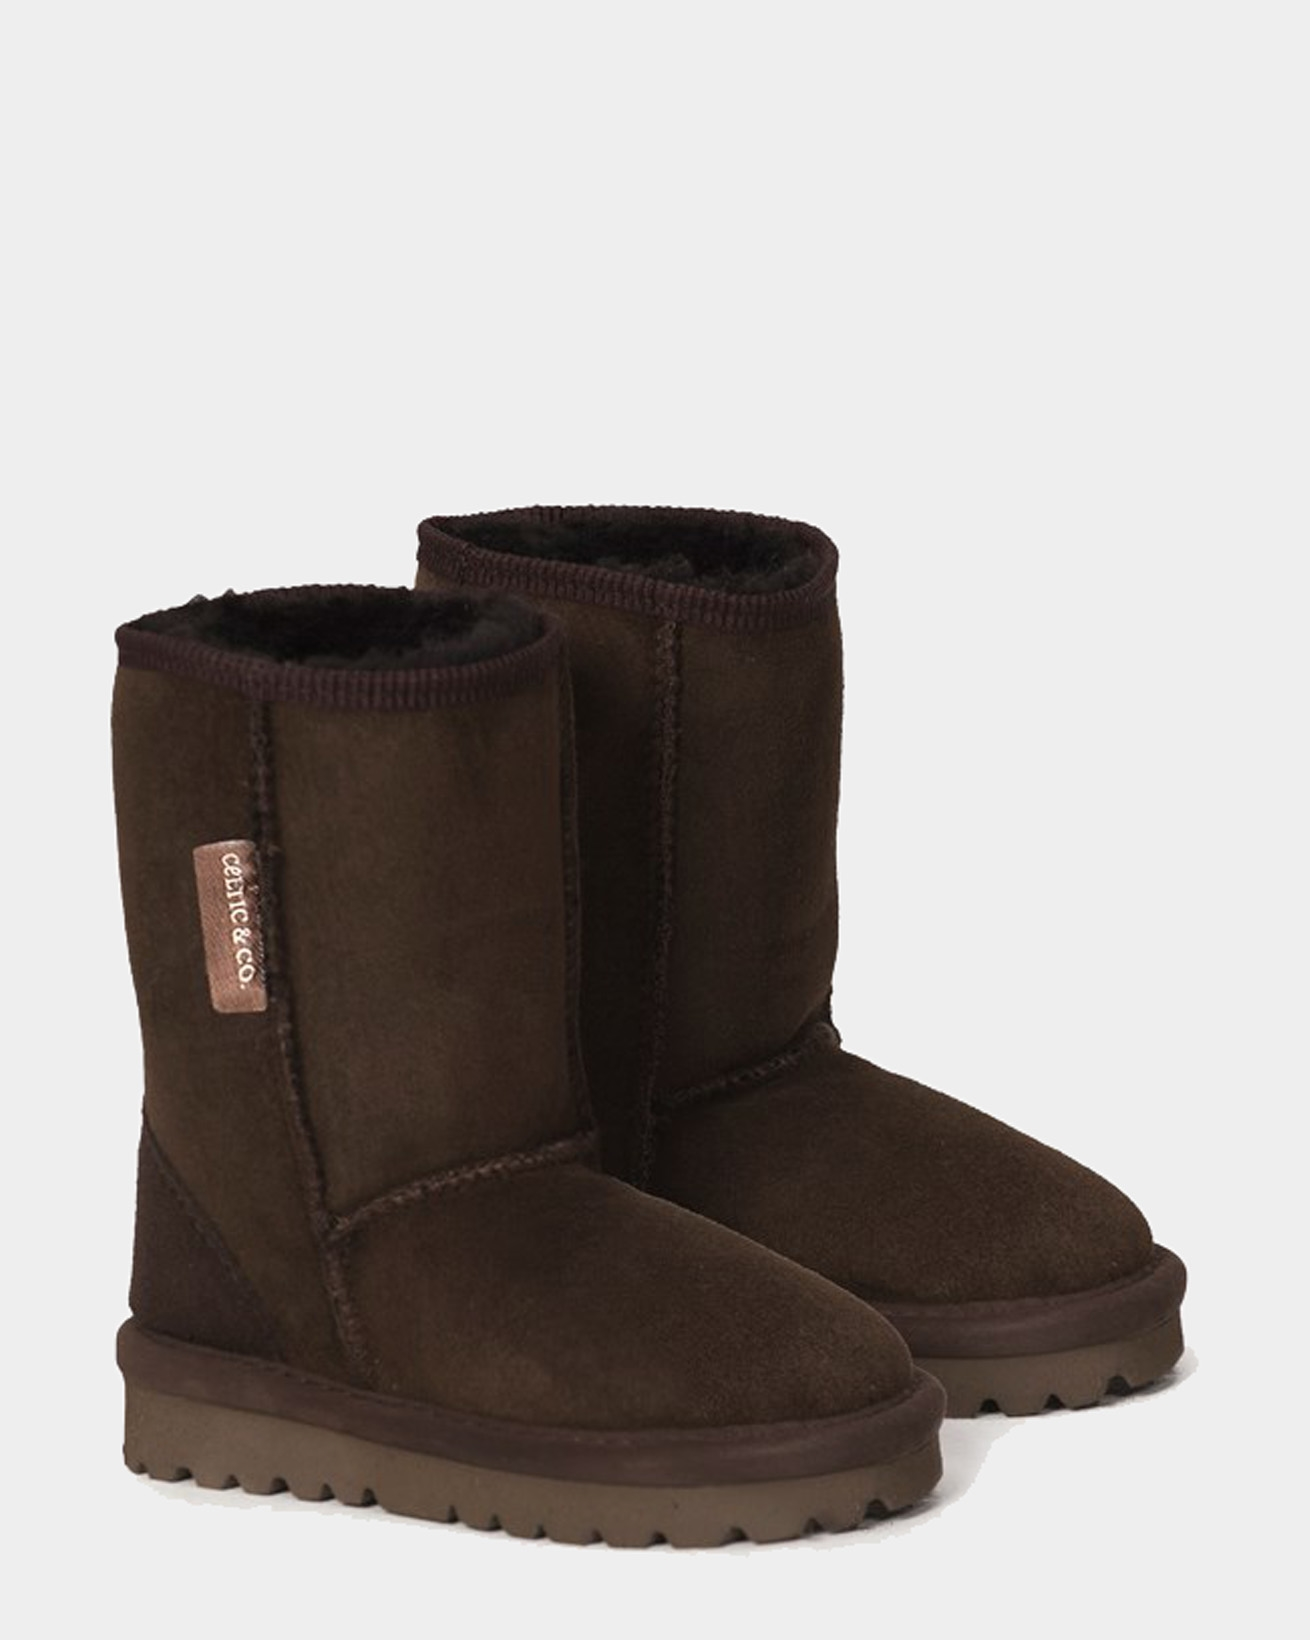 2404-kids-classic-boots-mocca-cutout-1.jpg